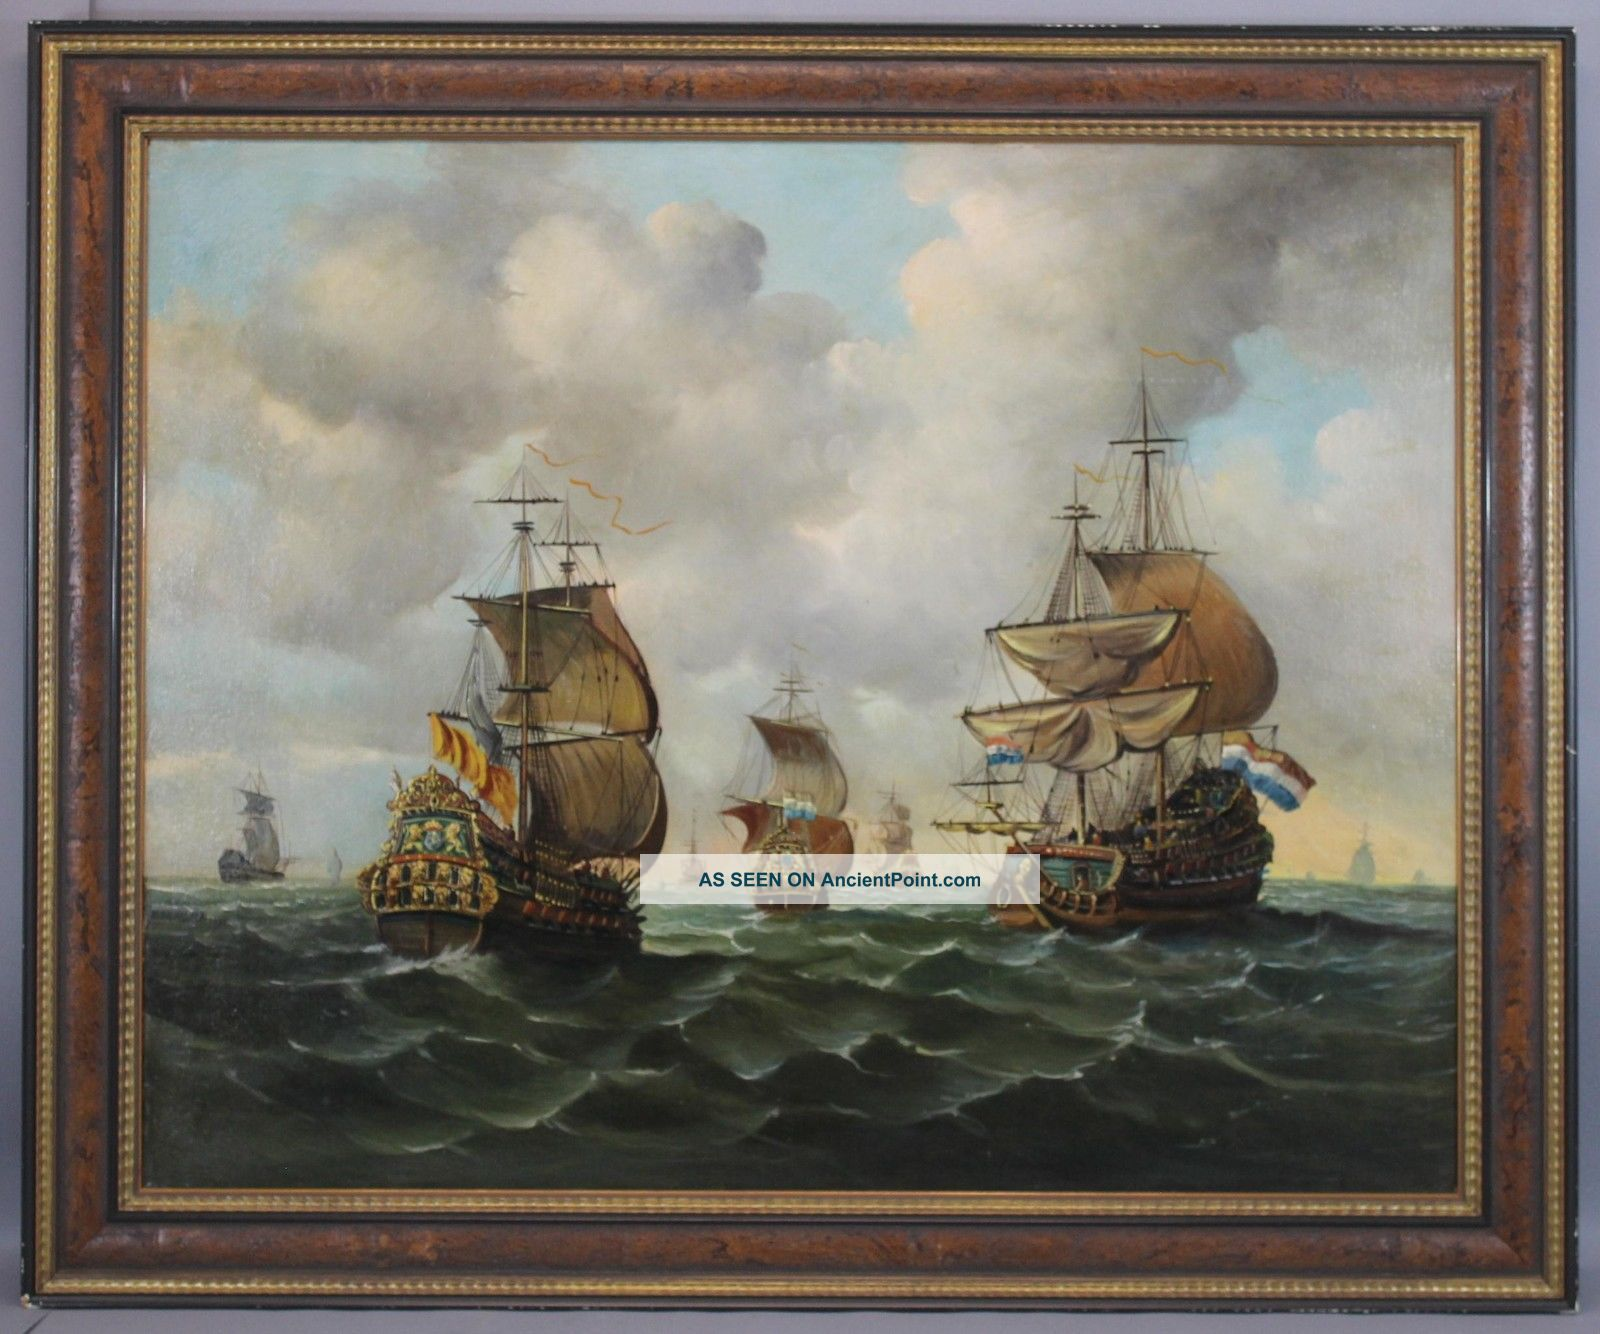 Lrg C1900 Maritime Seascape Oil Painting,  17thc Dutch Galleons Fleet & Flag Ship Other Maritime Antiques photo